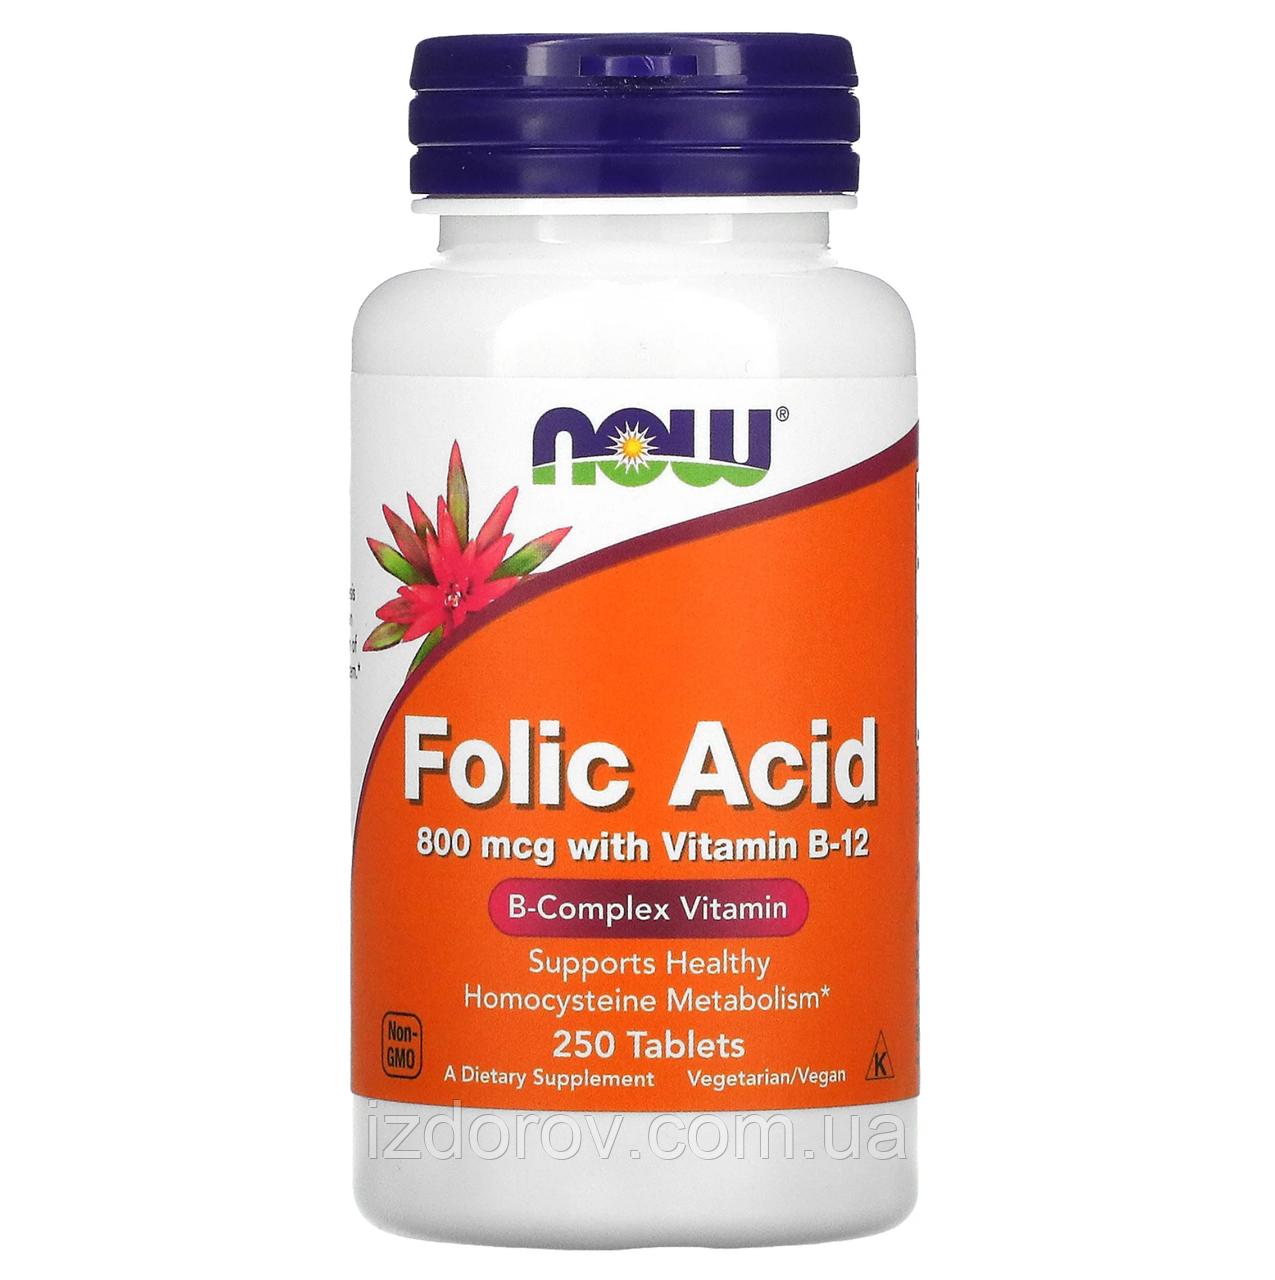 Now Foods, Фолиевая кислота, 800 мкг, Folic Acid, 250 таблеток